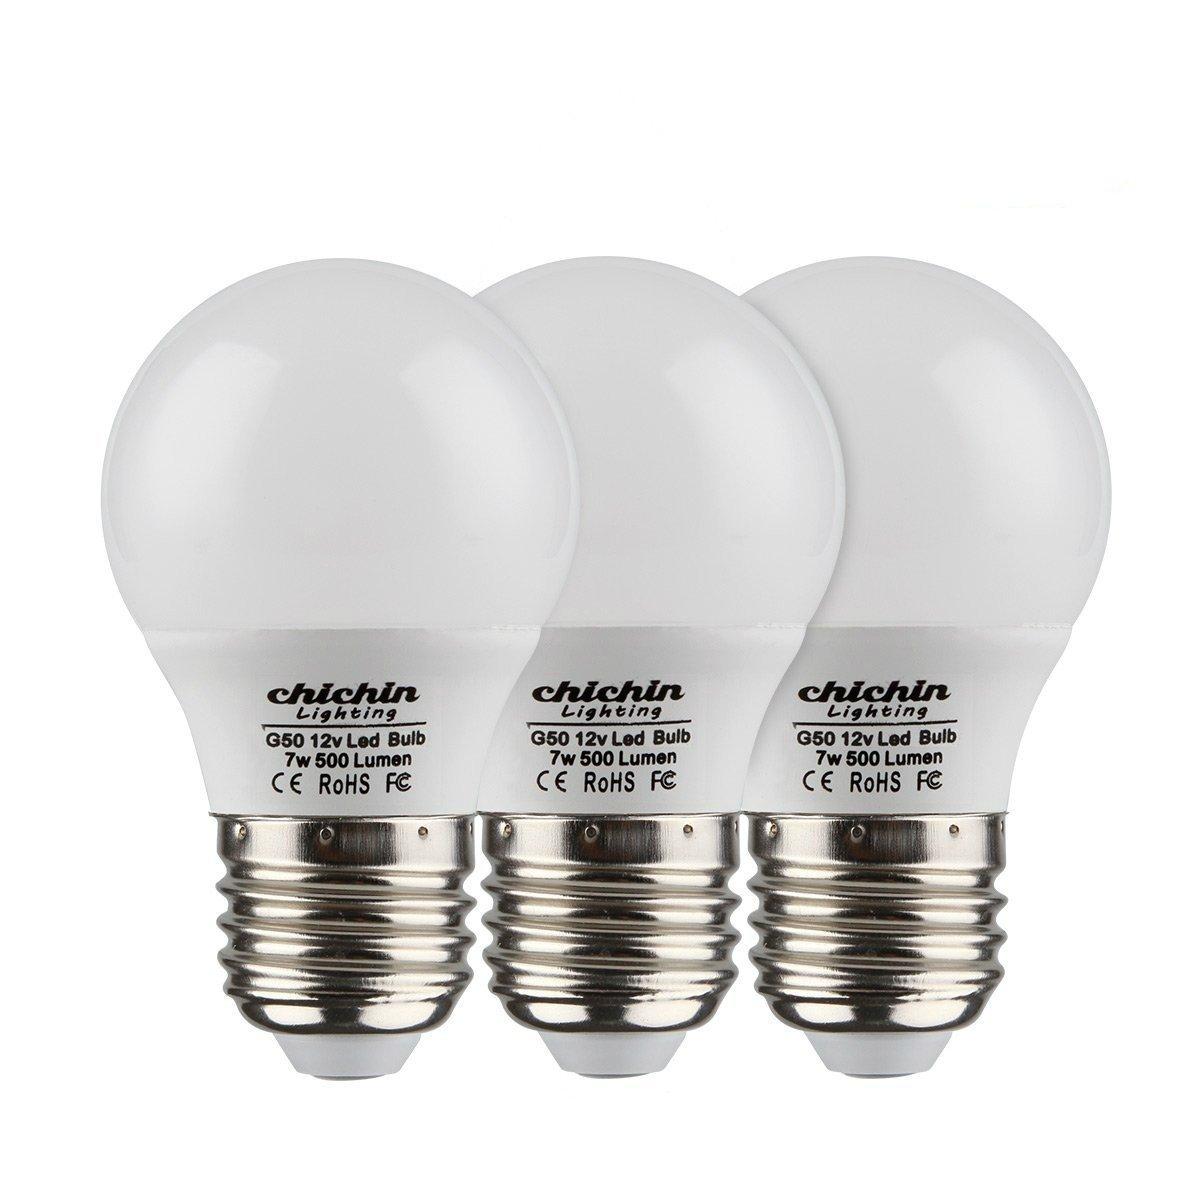 Details about ChiChinLighting 12 Volt 7 Watt LED Light Bulb (3 Bulbs Per  Pack) - E26/E27 Light